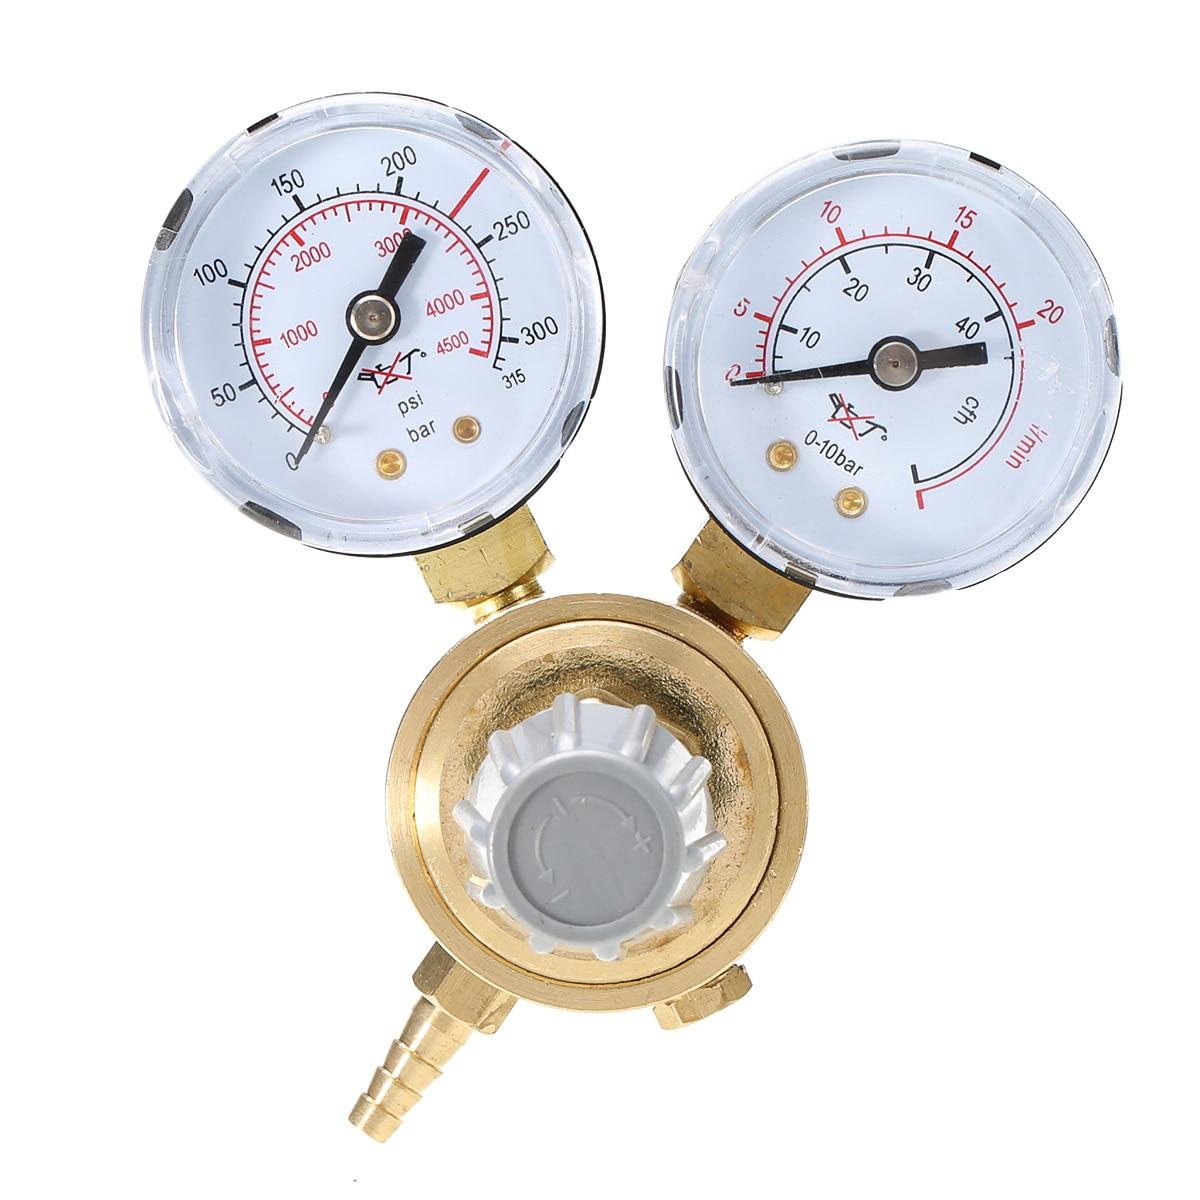 Professional Argon CO2 Pressure Reducer Copper Mig Flow Control Valve Dual Gauge Welding Regulator